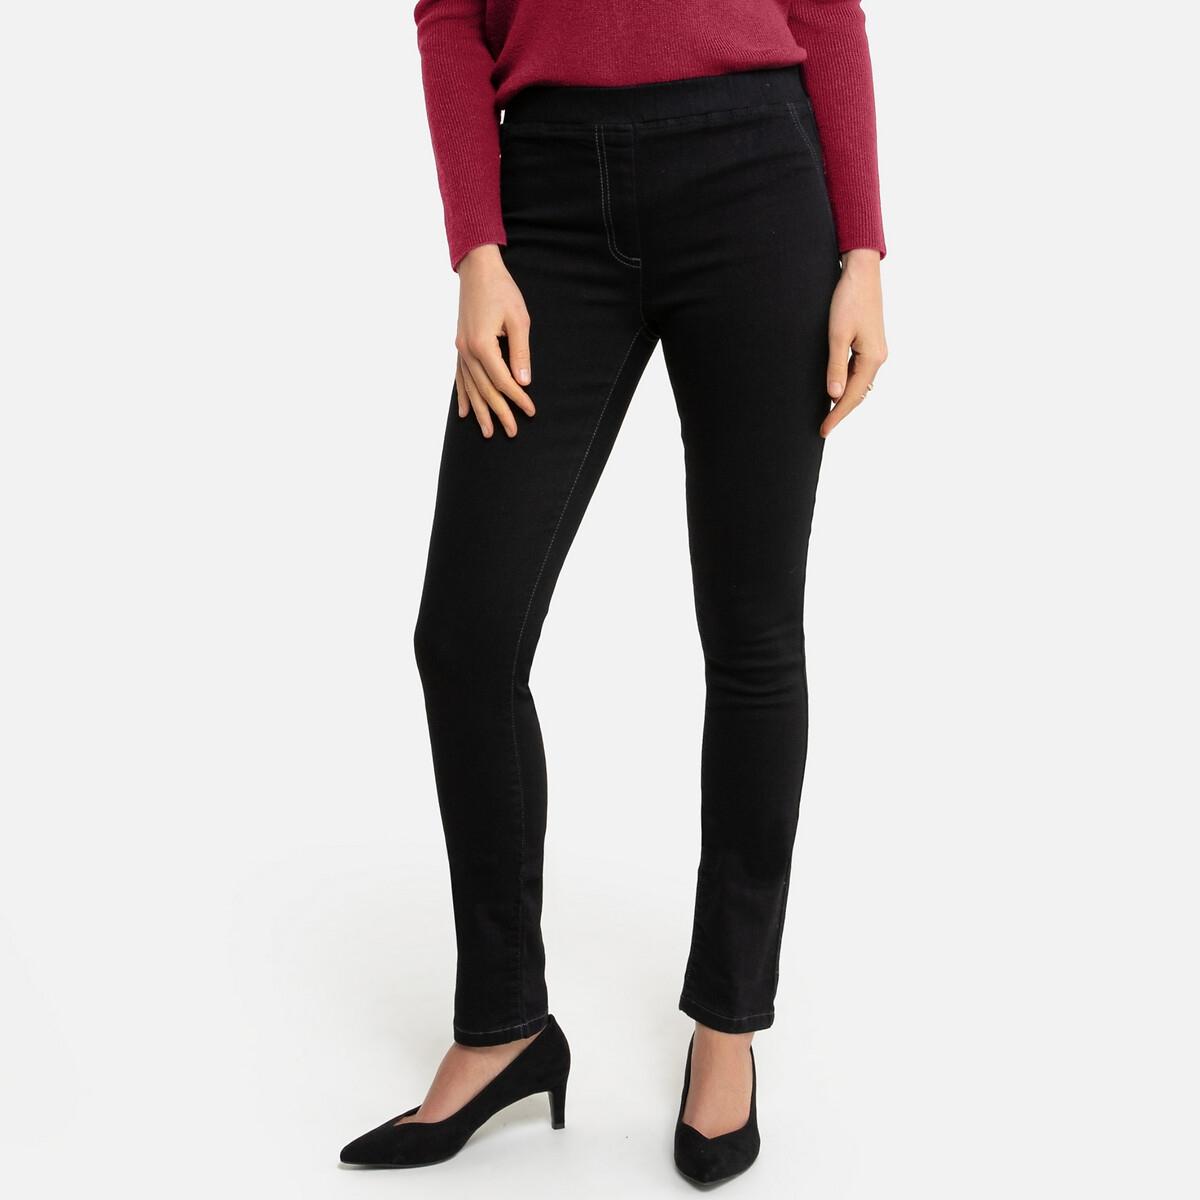 Jeans tipo jeggings, cós elástico